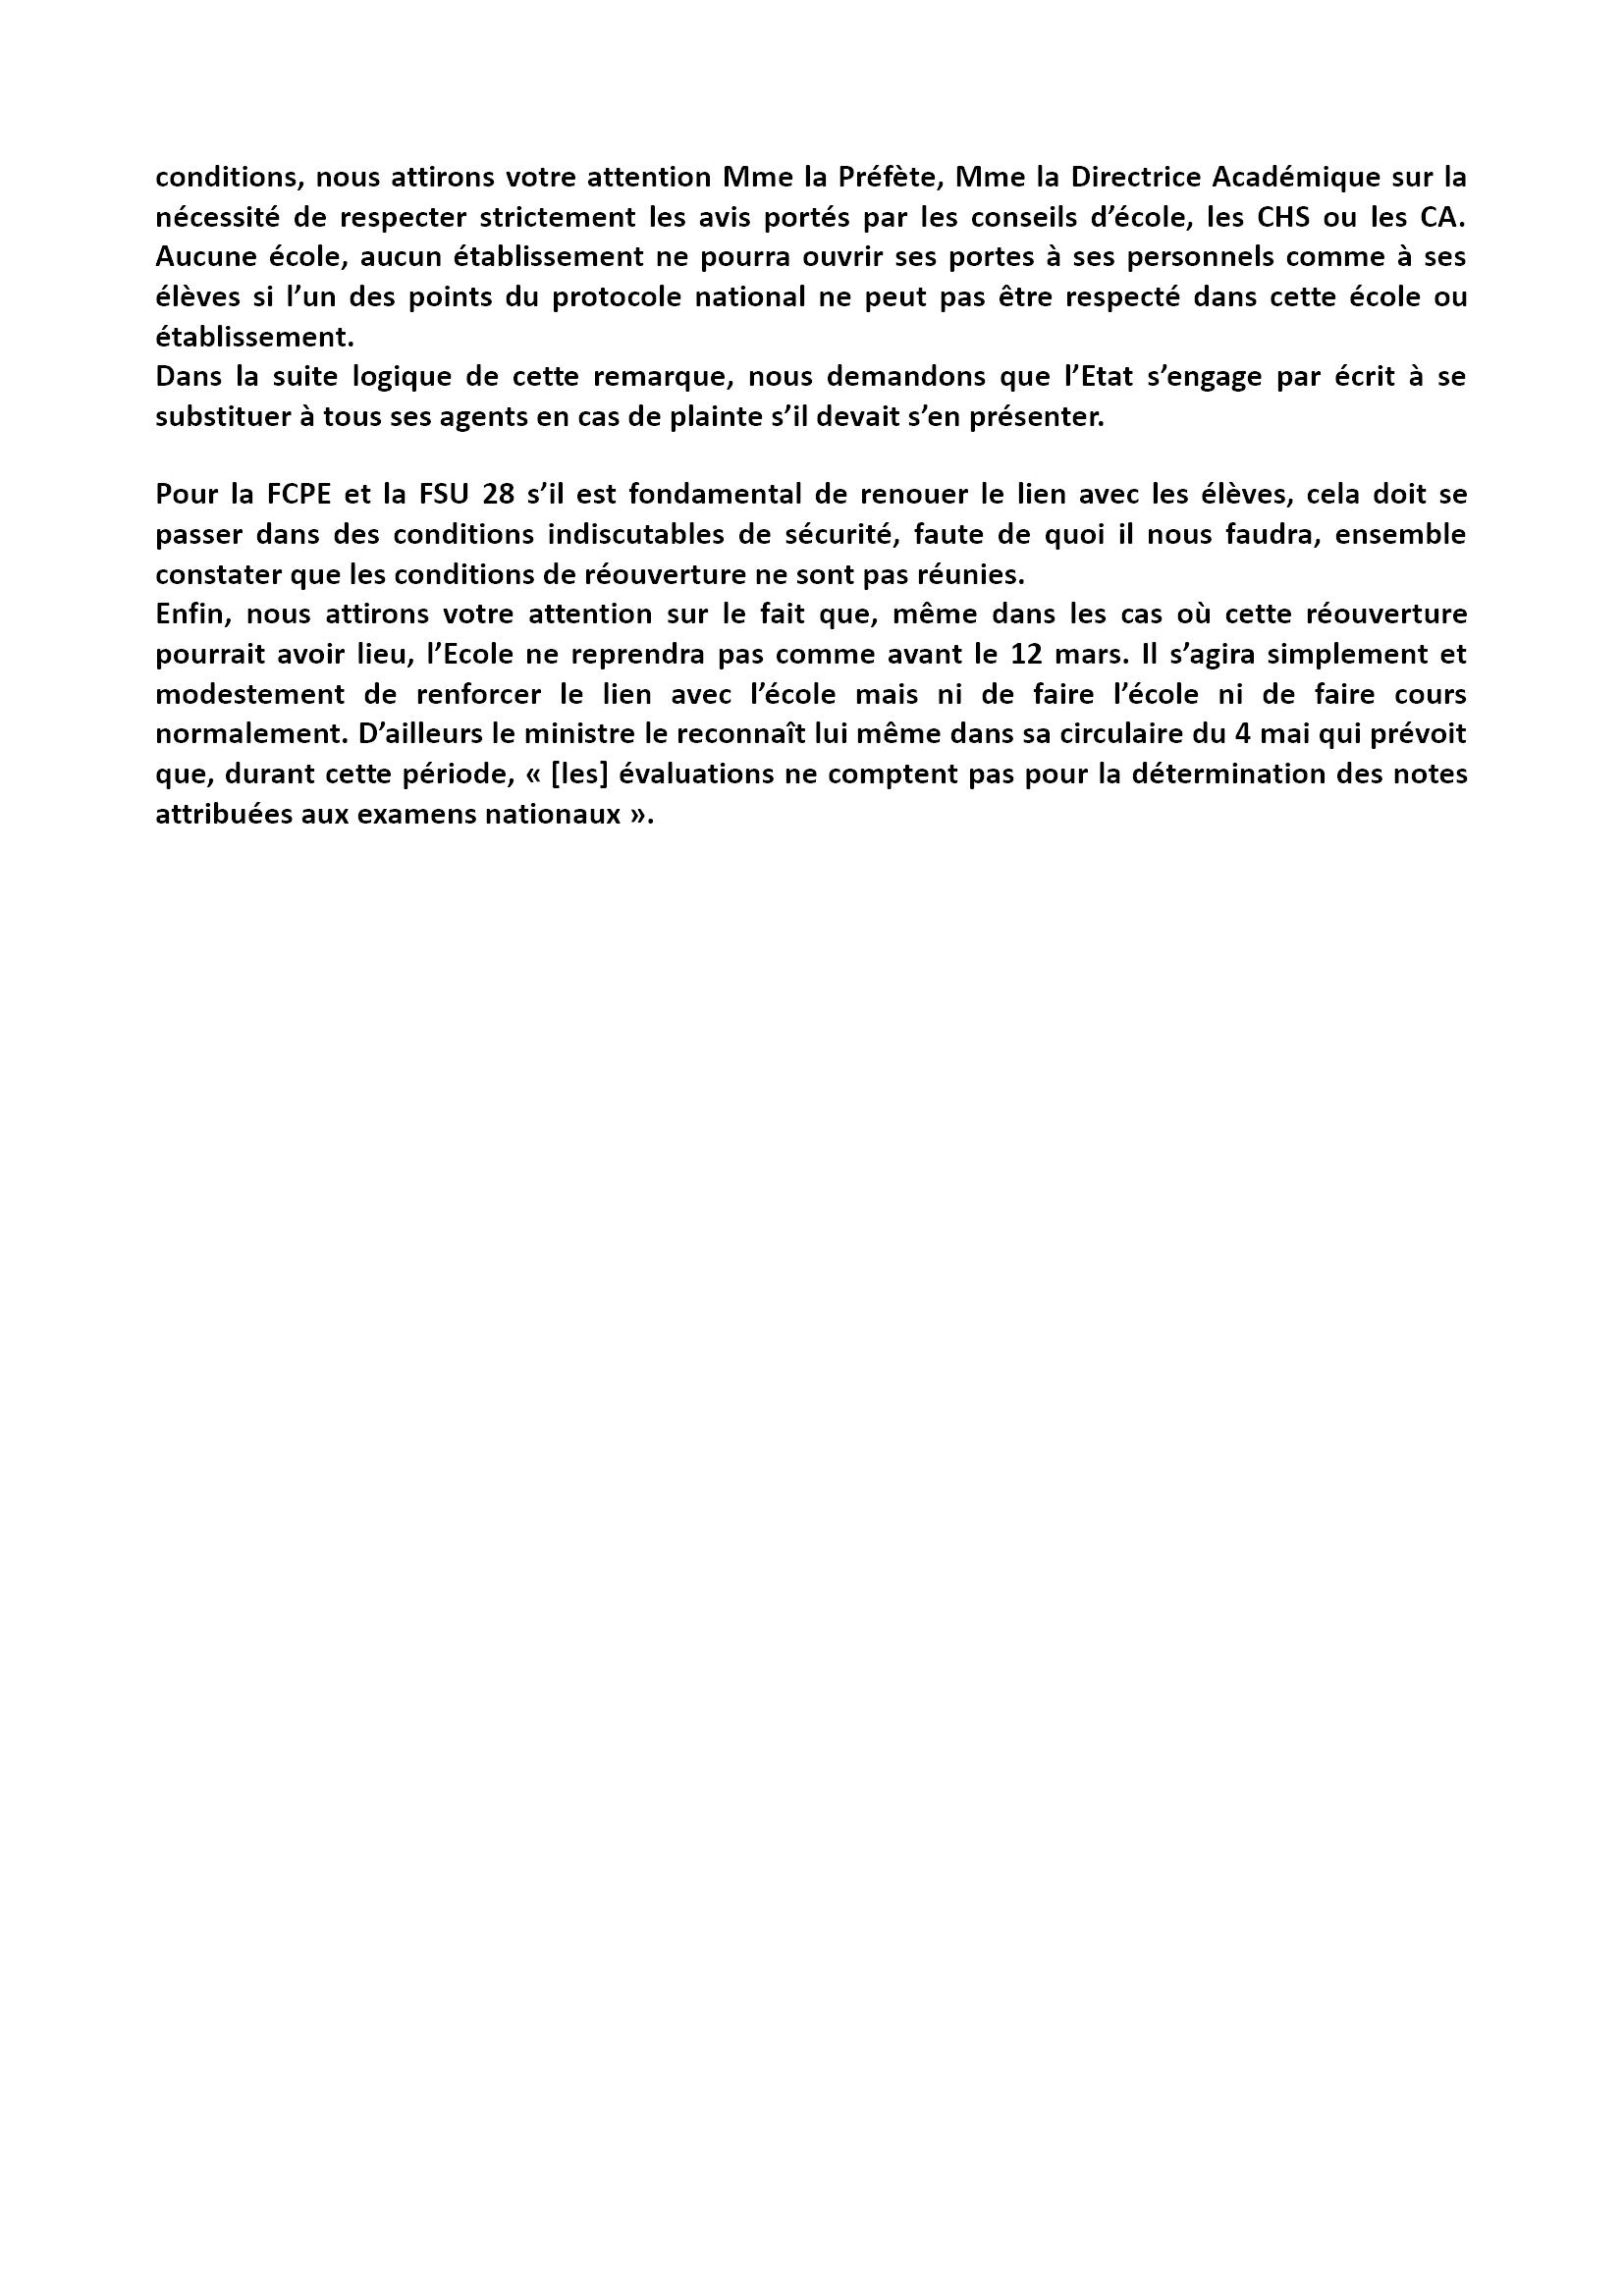 FCPE-FSU 28 Déclaration-CDEN-4-mai2020 Reprise 3x3